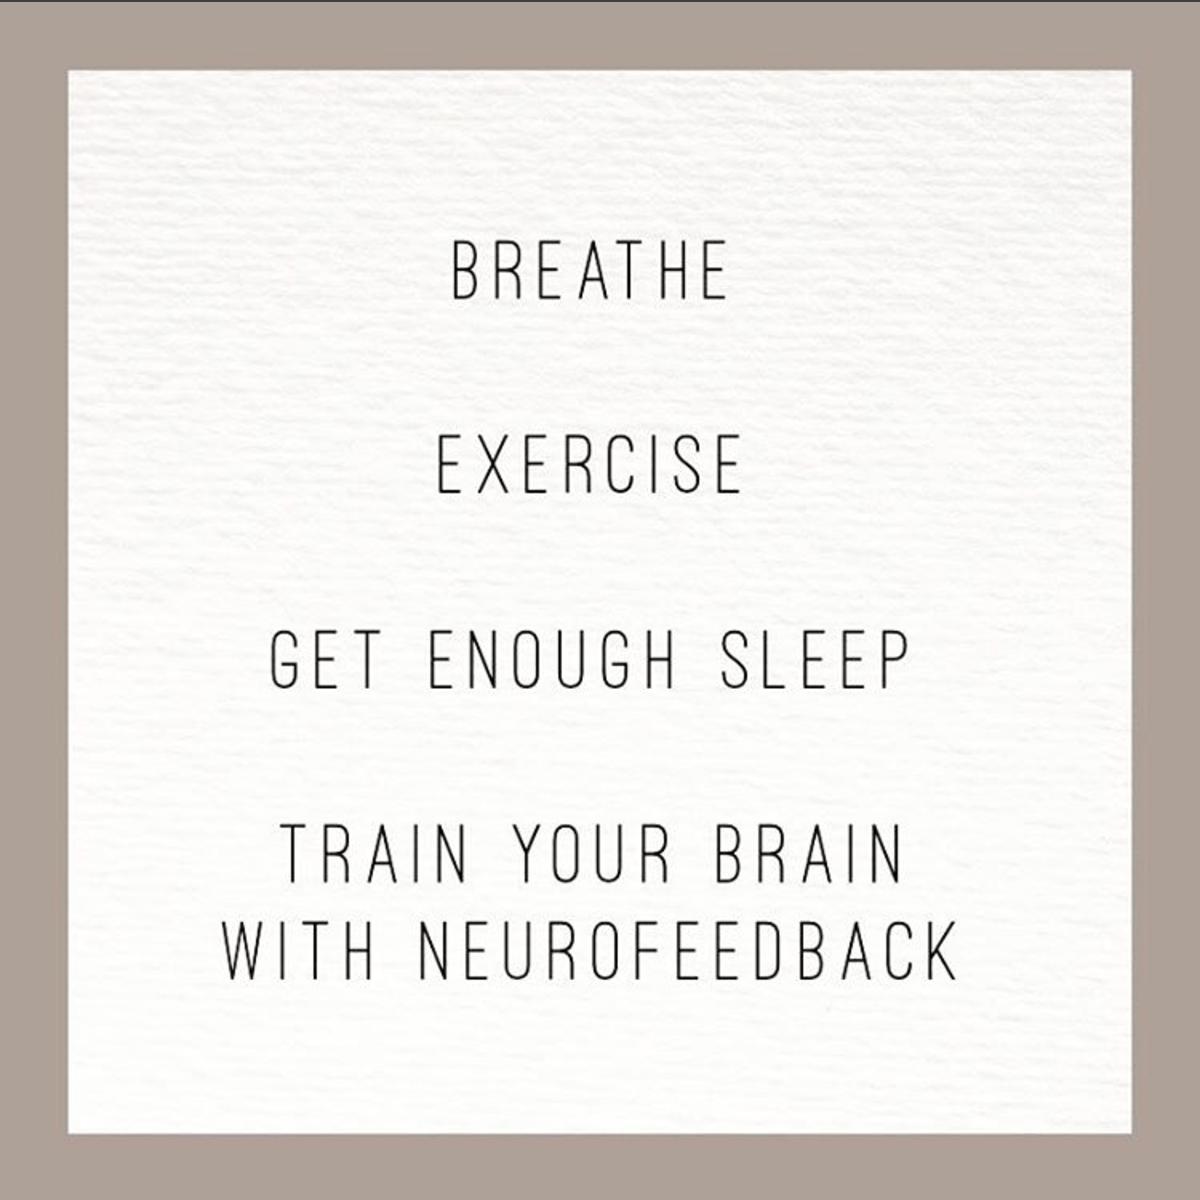 Self-regulate tips neurofeedback results